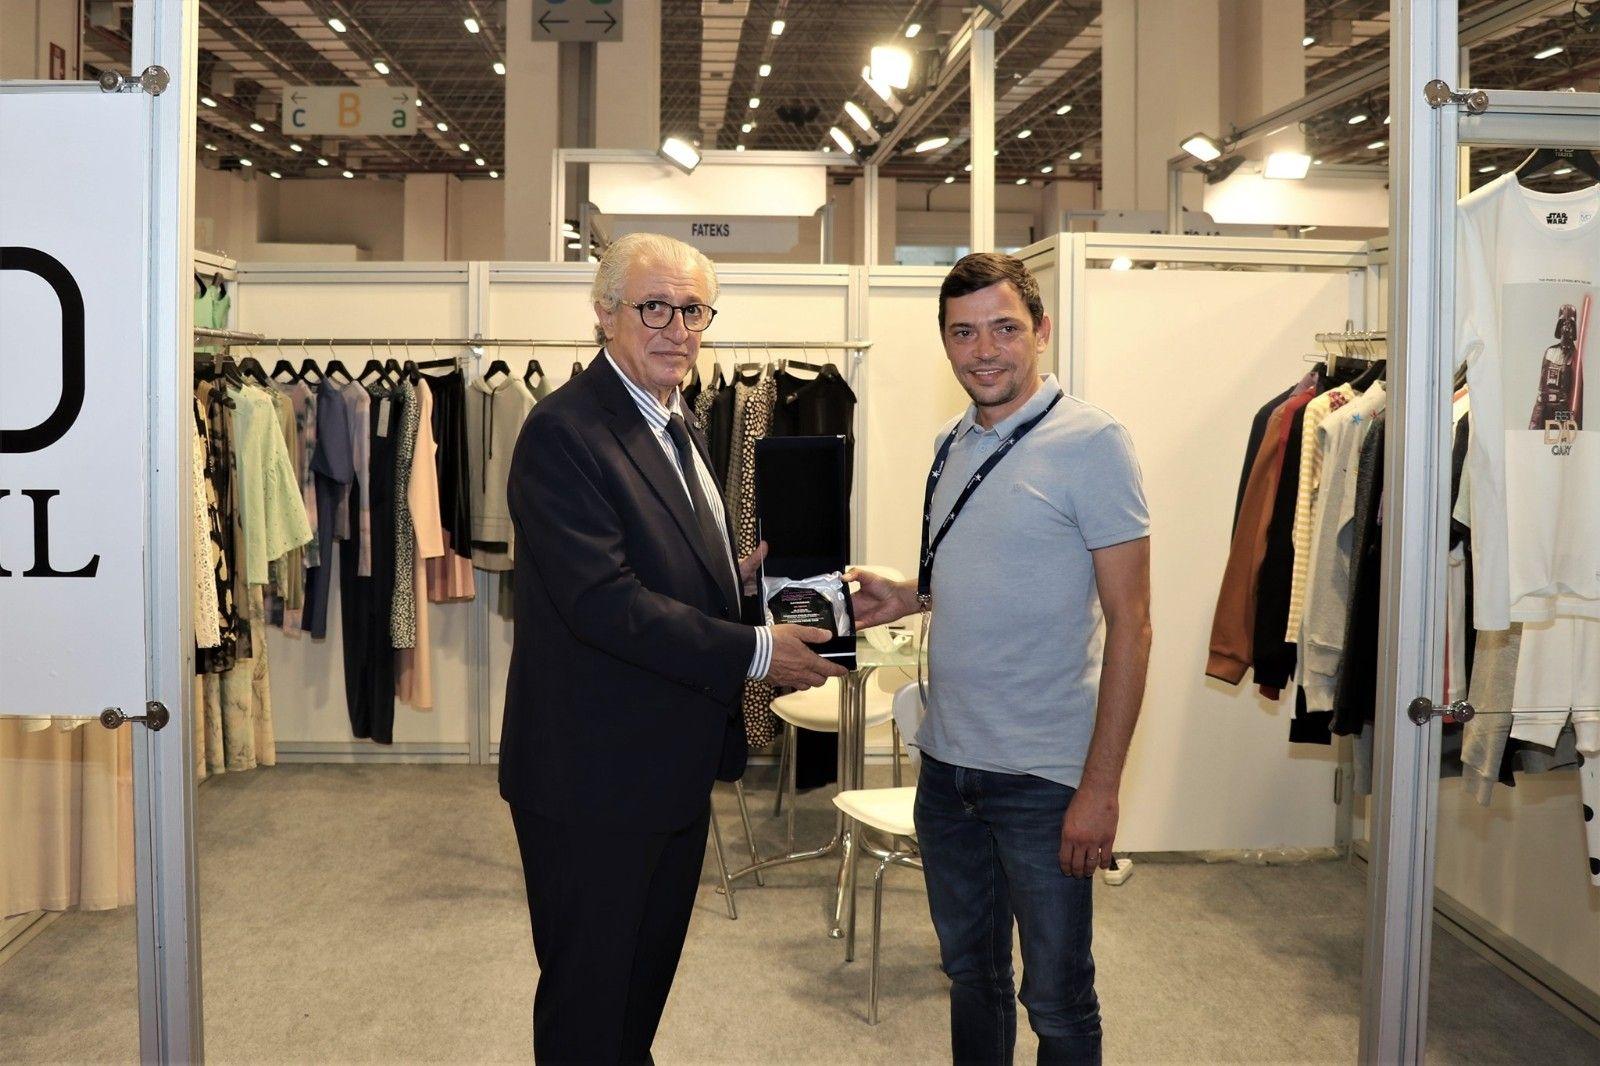 2021/09/fashion-prime-fuari-ile-15-milyar-dolar-ihracat-hedefine-ulasacak-20210918AW42-1.jpg